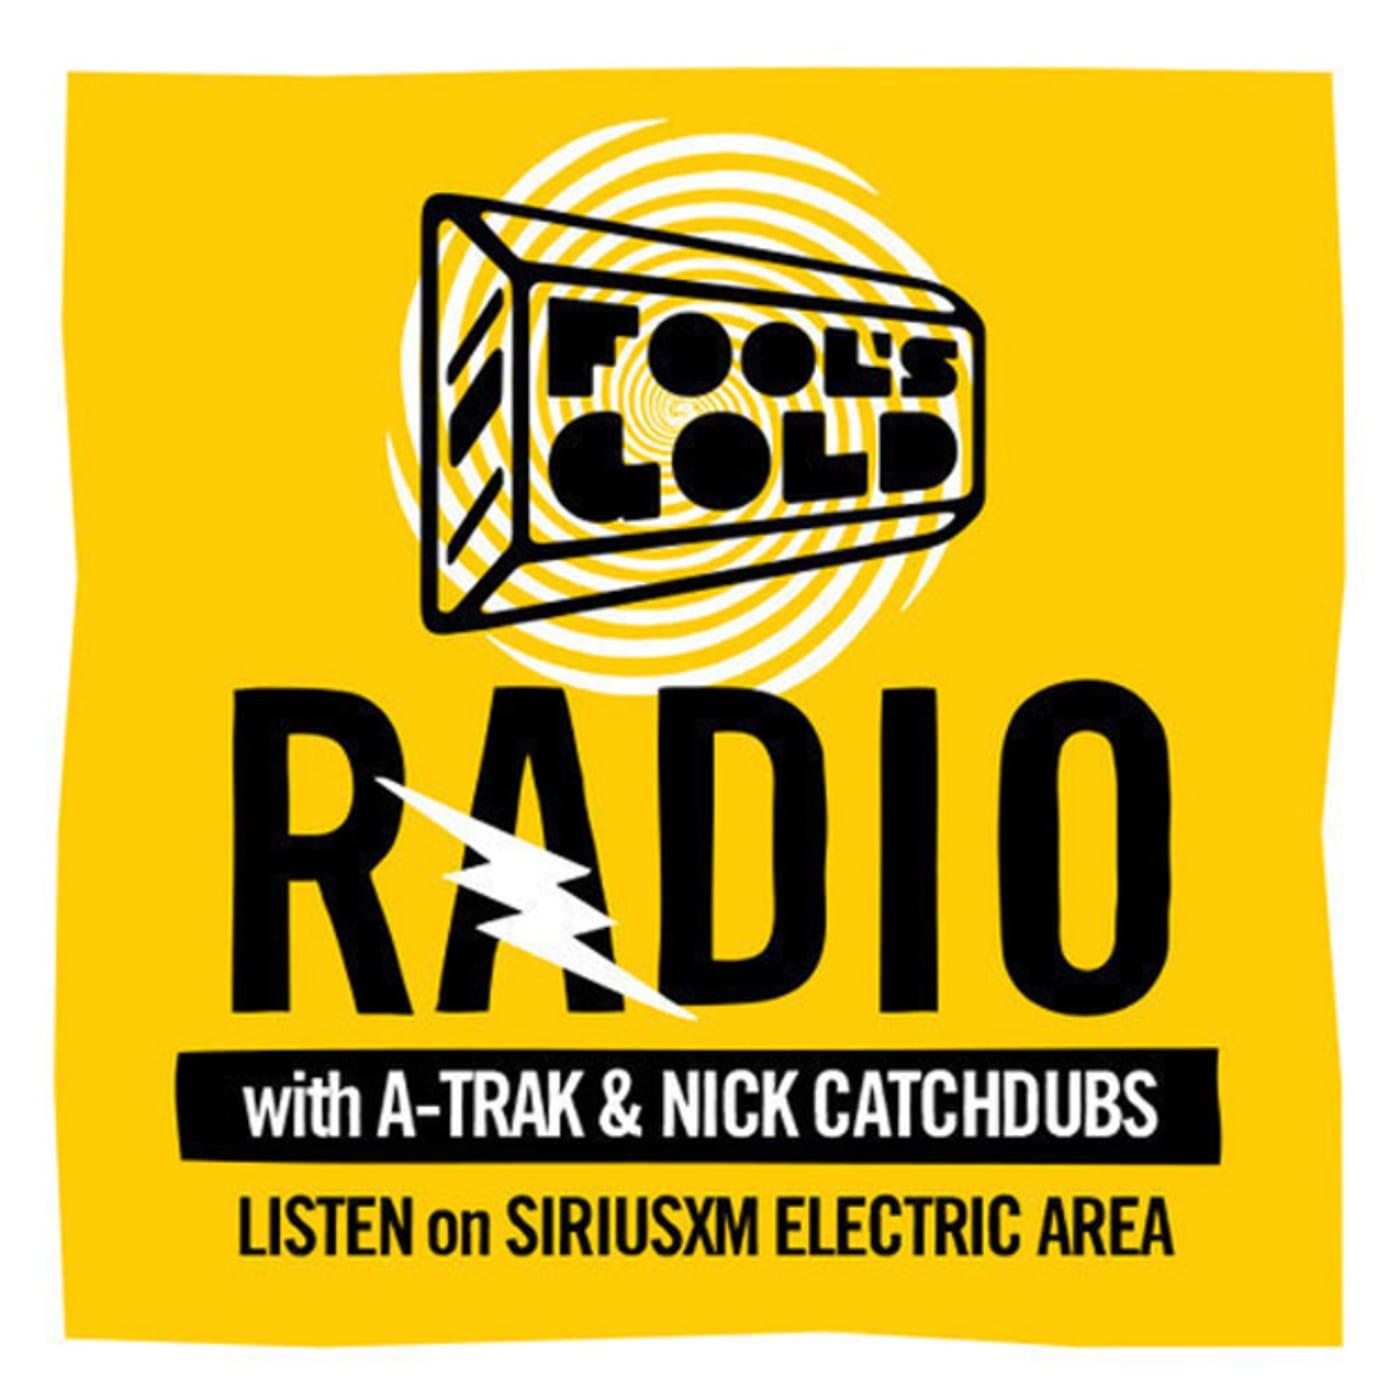 fools gold radio logo